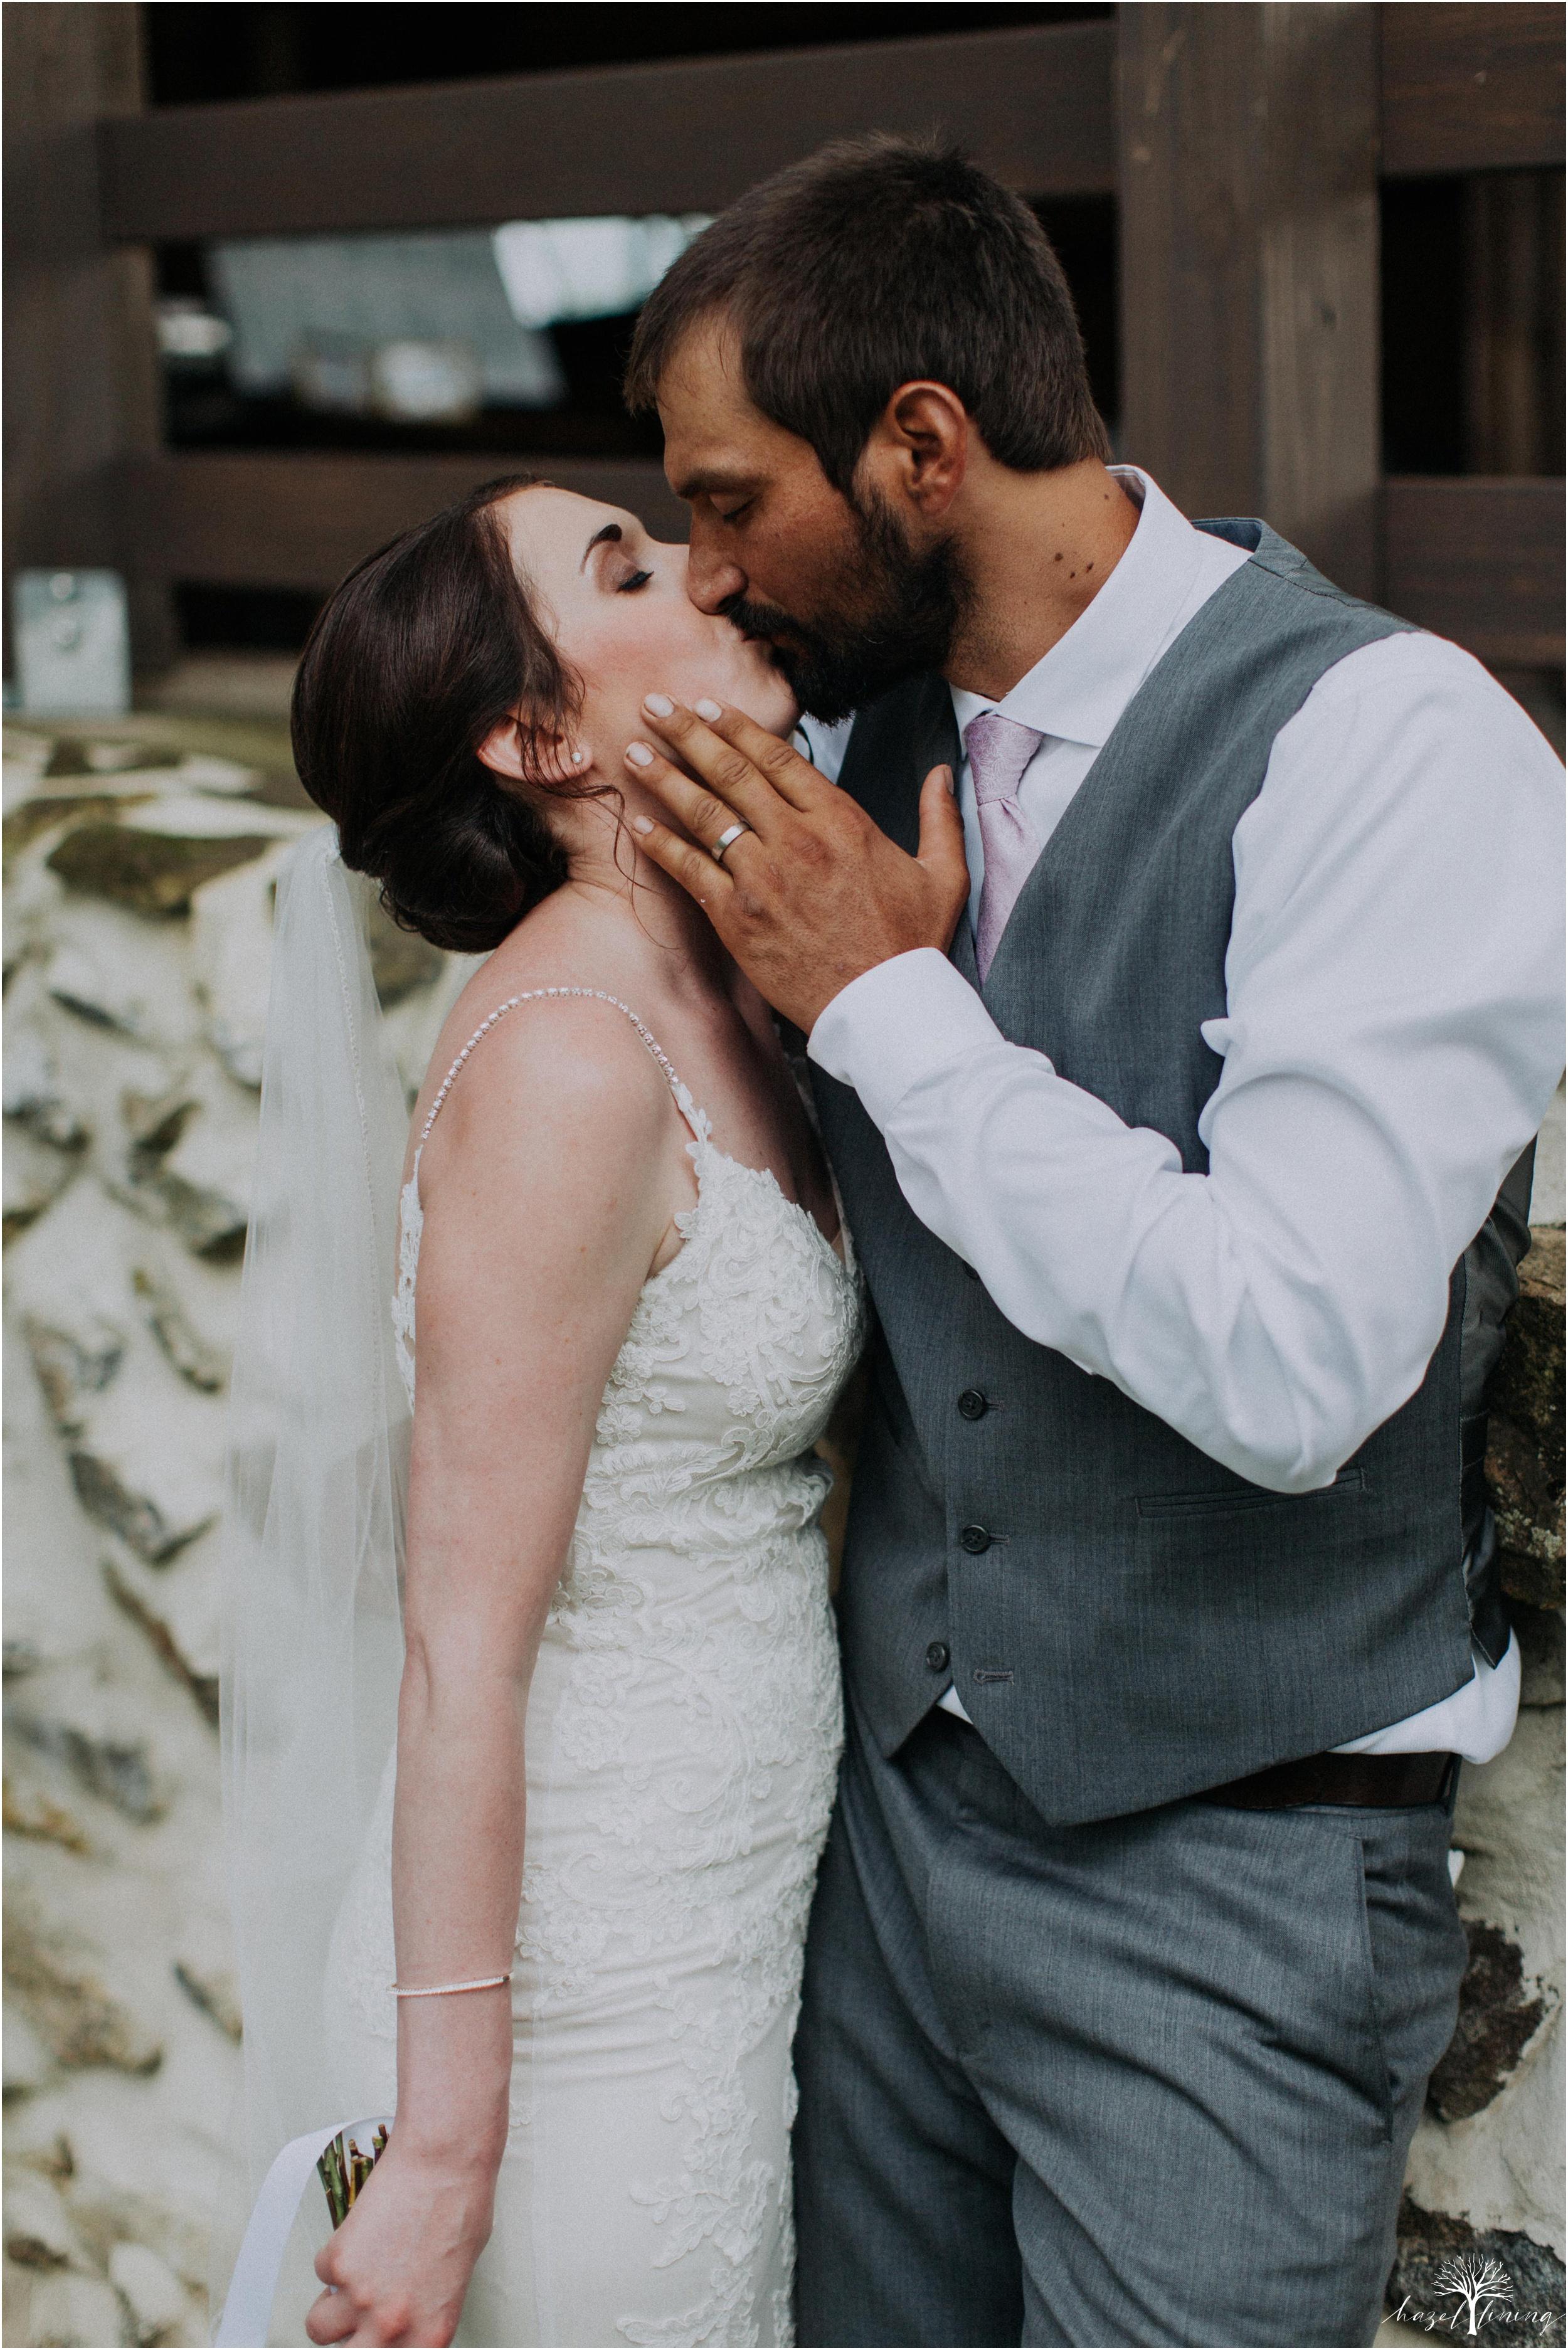 hazel-lining-travel-wedding-elopement-photography-lisa-landon-shoemaker-the-farm-bakery-and-events-bucks-county-quakertown-pennsylvania-summer-country-outdoor-farm-wedding_0103.jpg